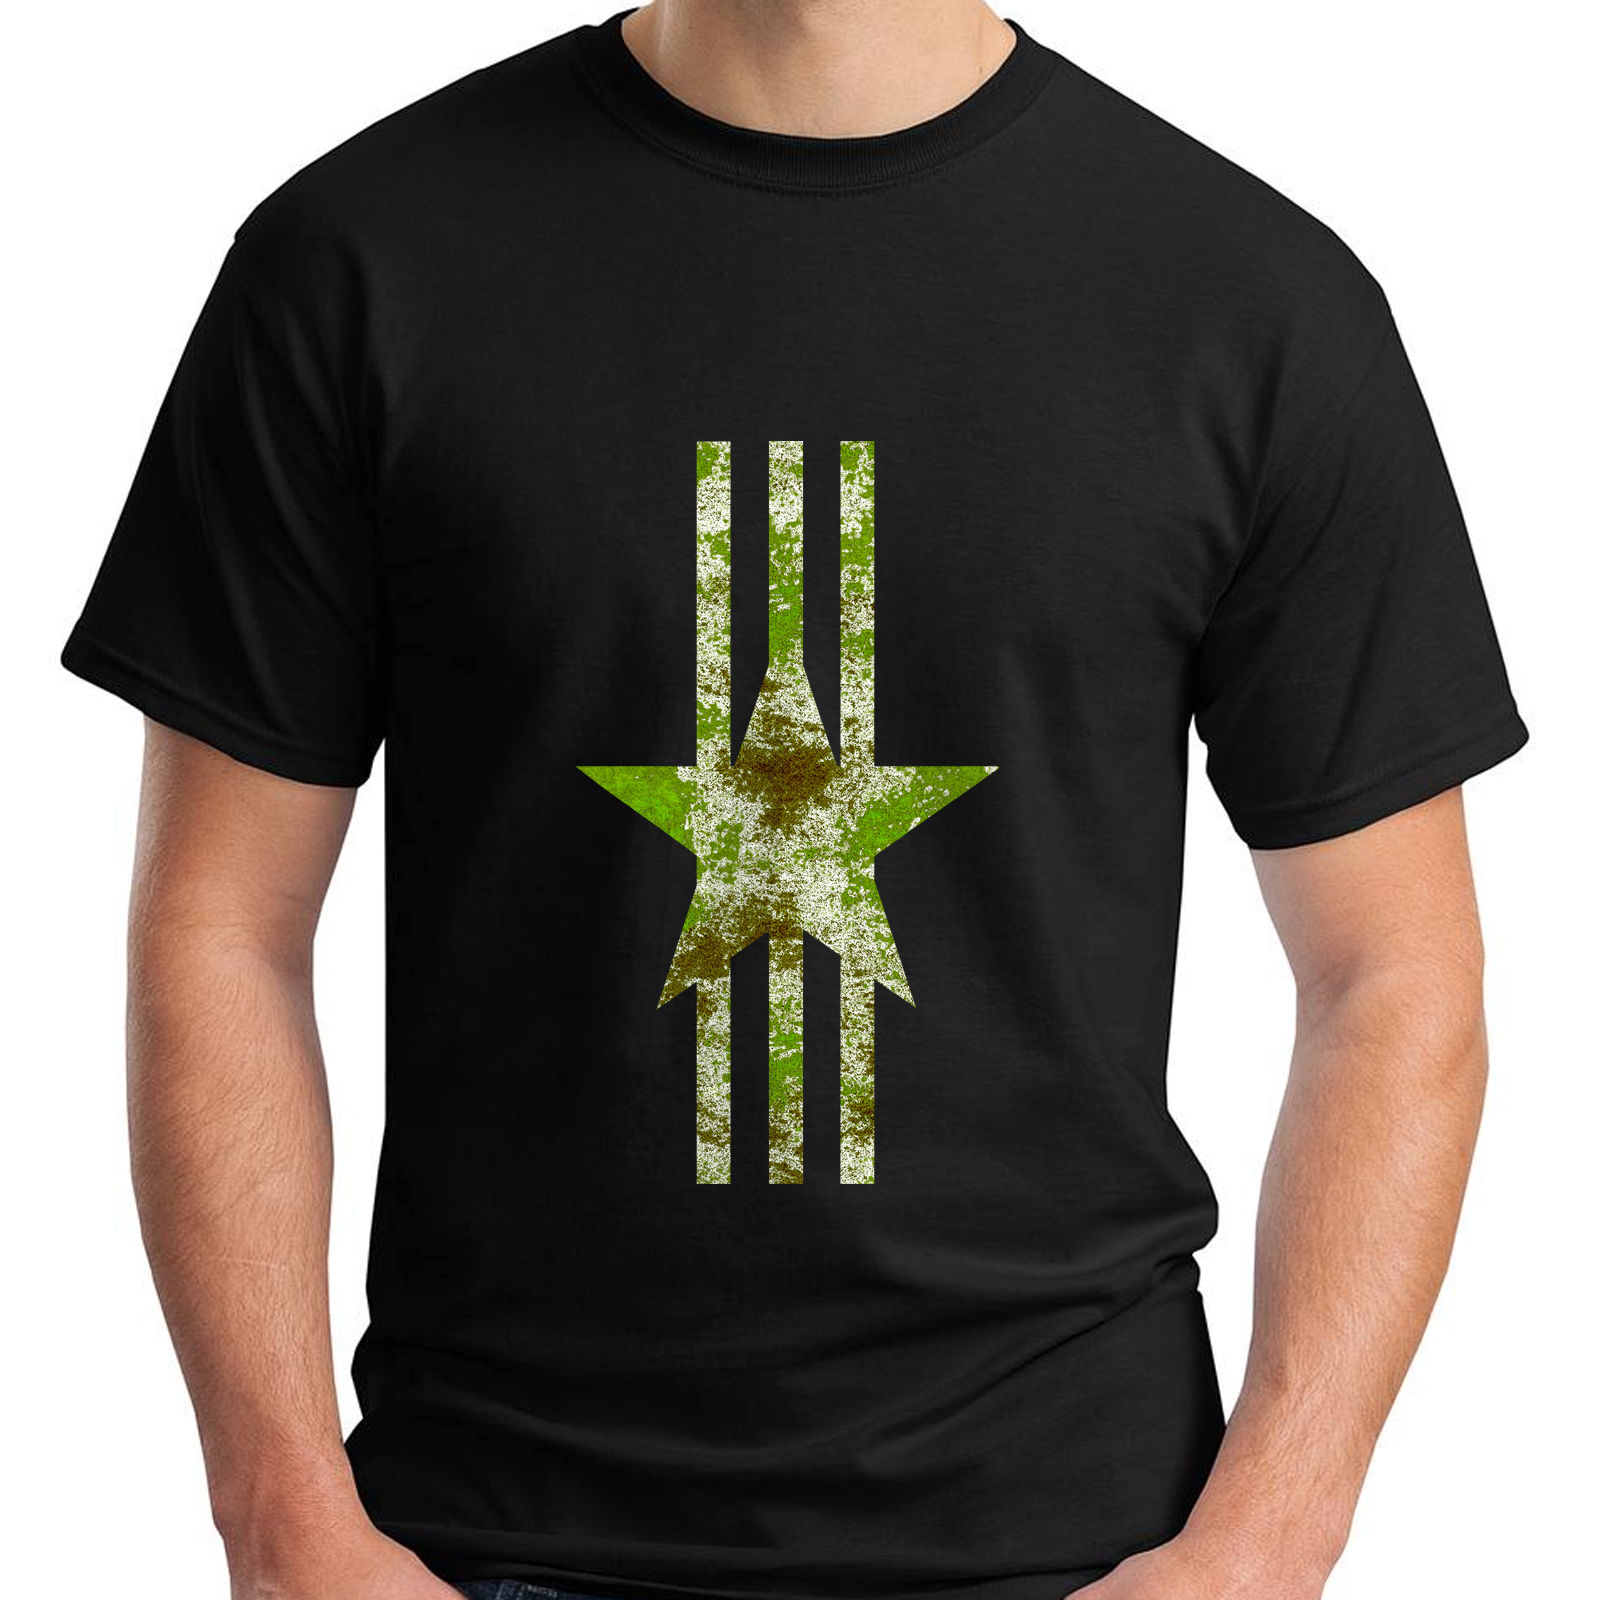 New Military Green Camo Star Logo White Stripes Conservative Mens Black T-Shirt